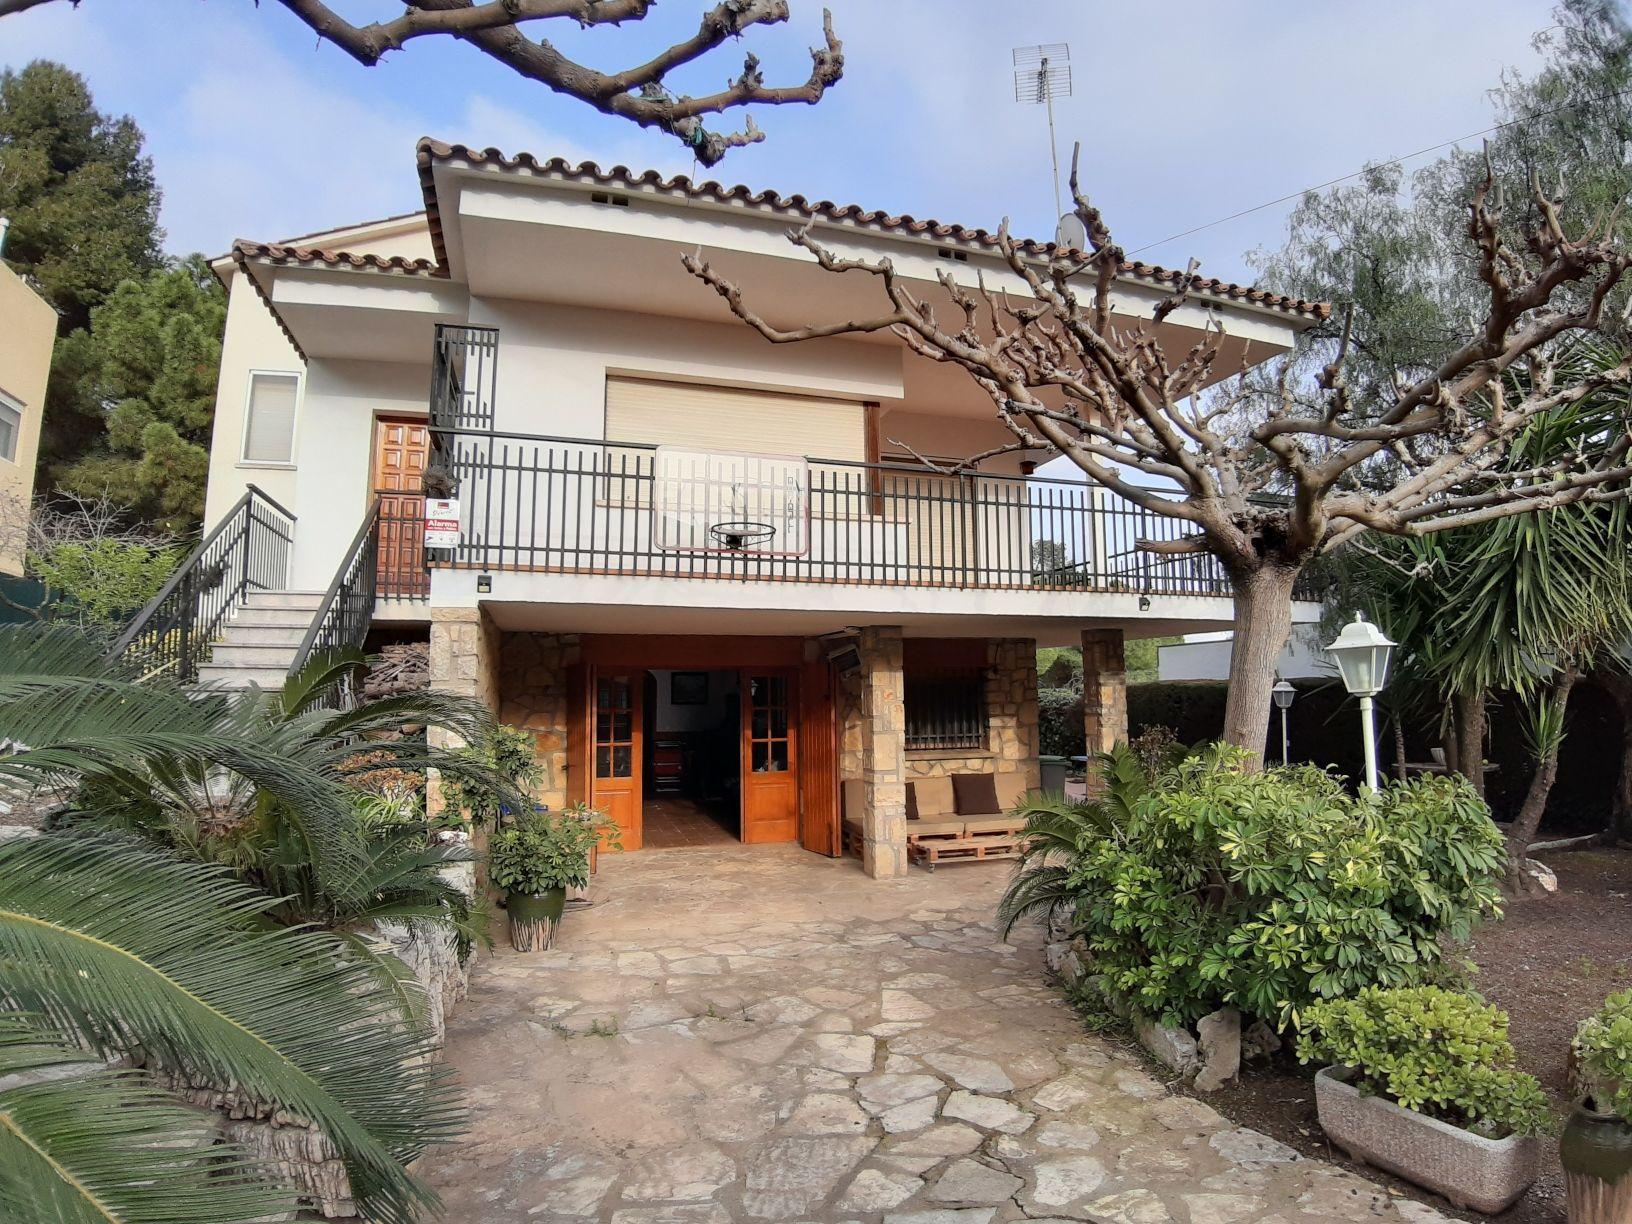 Casa / Chalet en Corbera de Llobregat, Santa María de l'Avall, venta